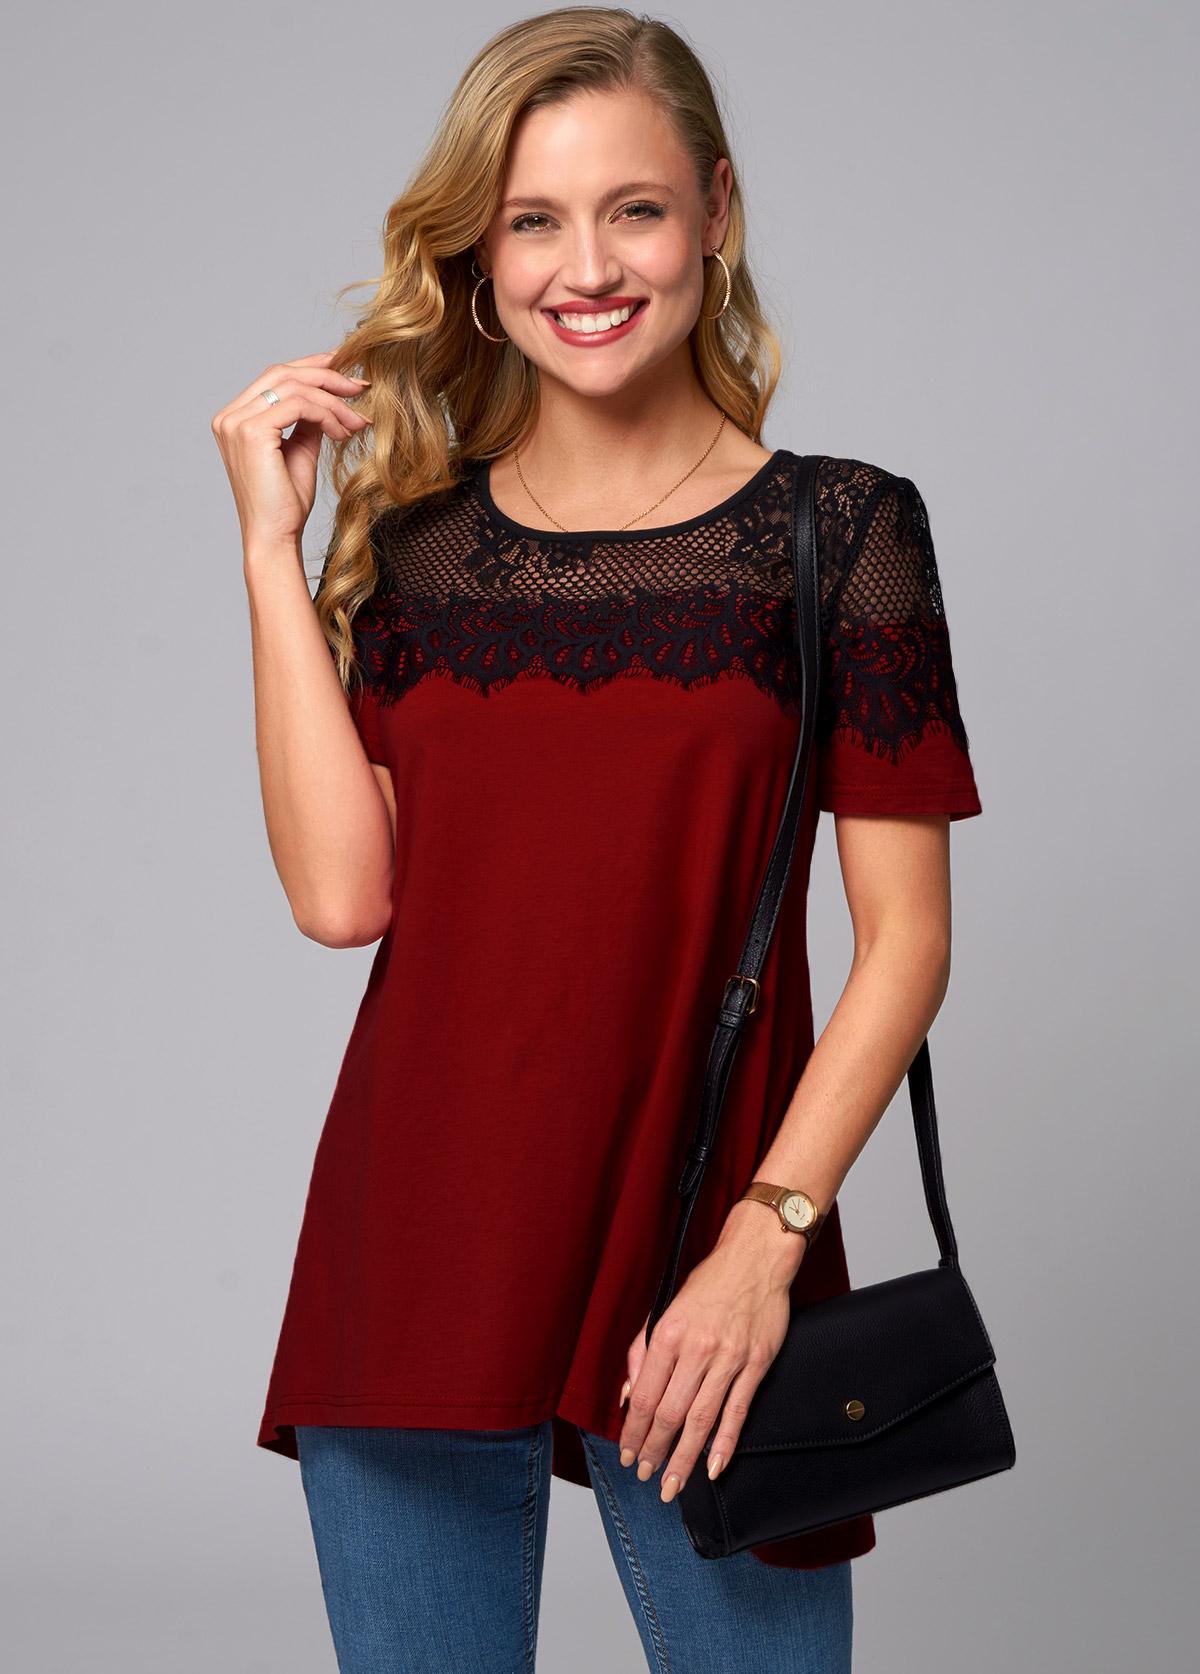 ROTITA Round Neck Short Sleeve Lace Stitching T Shirt